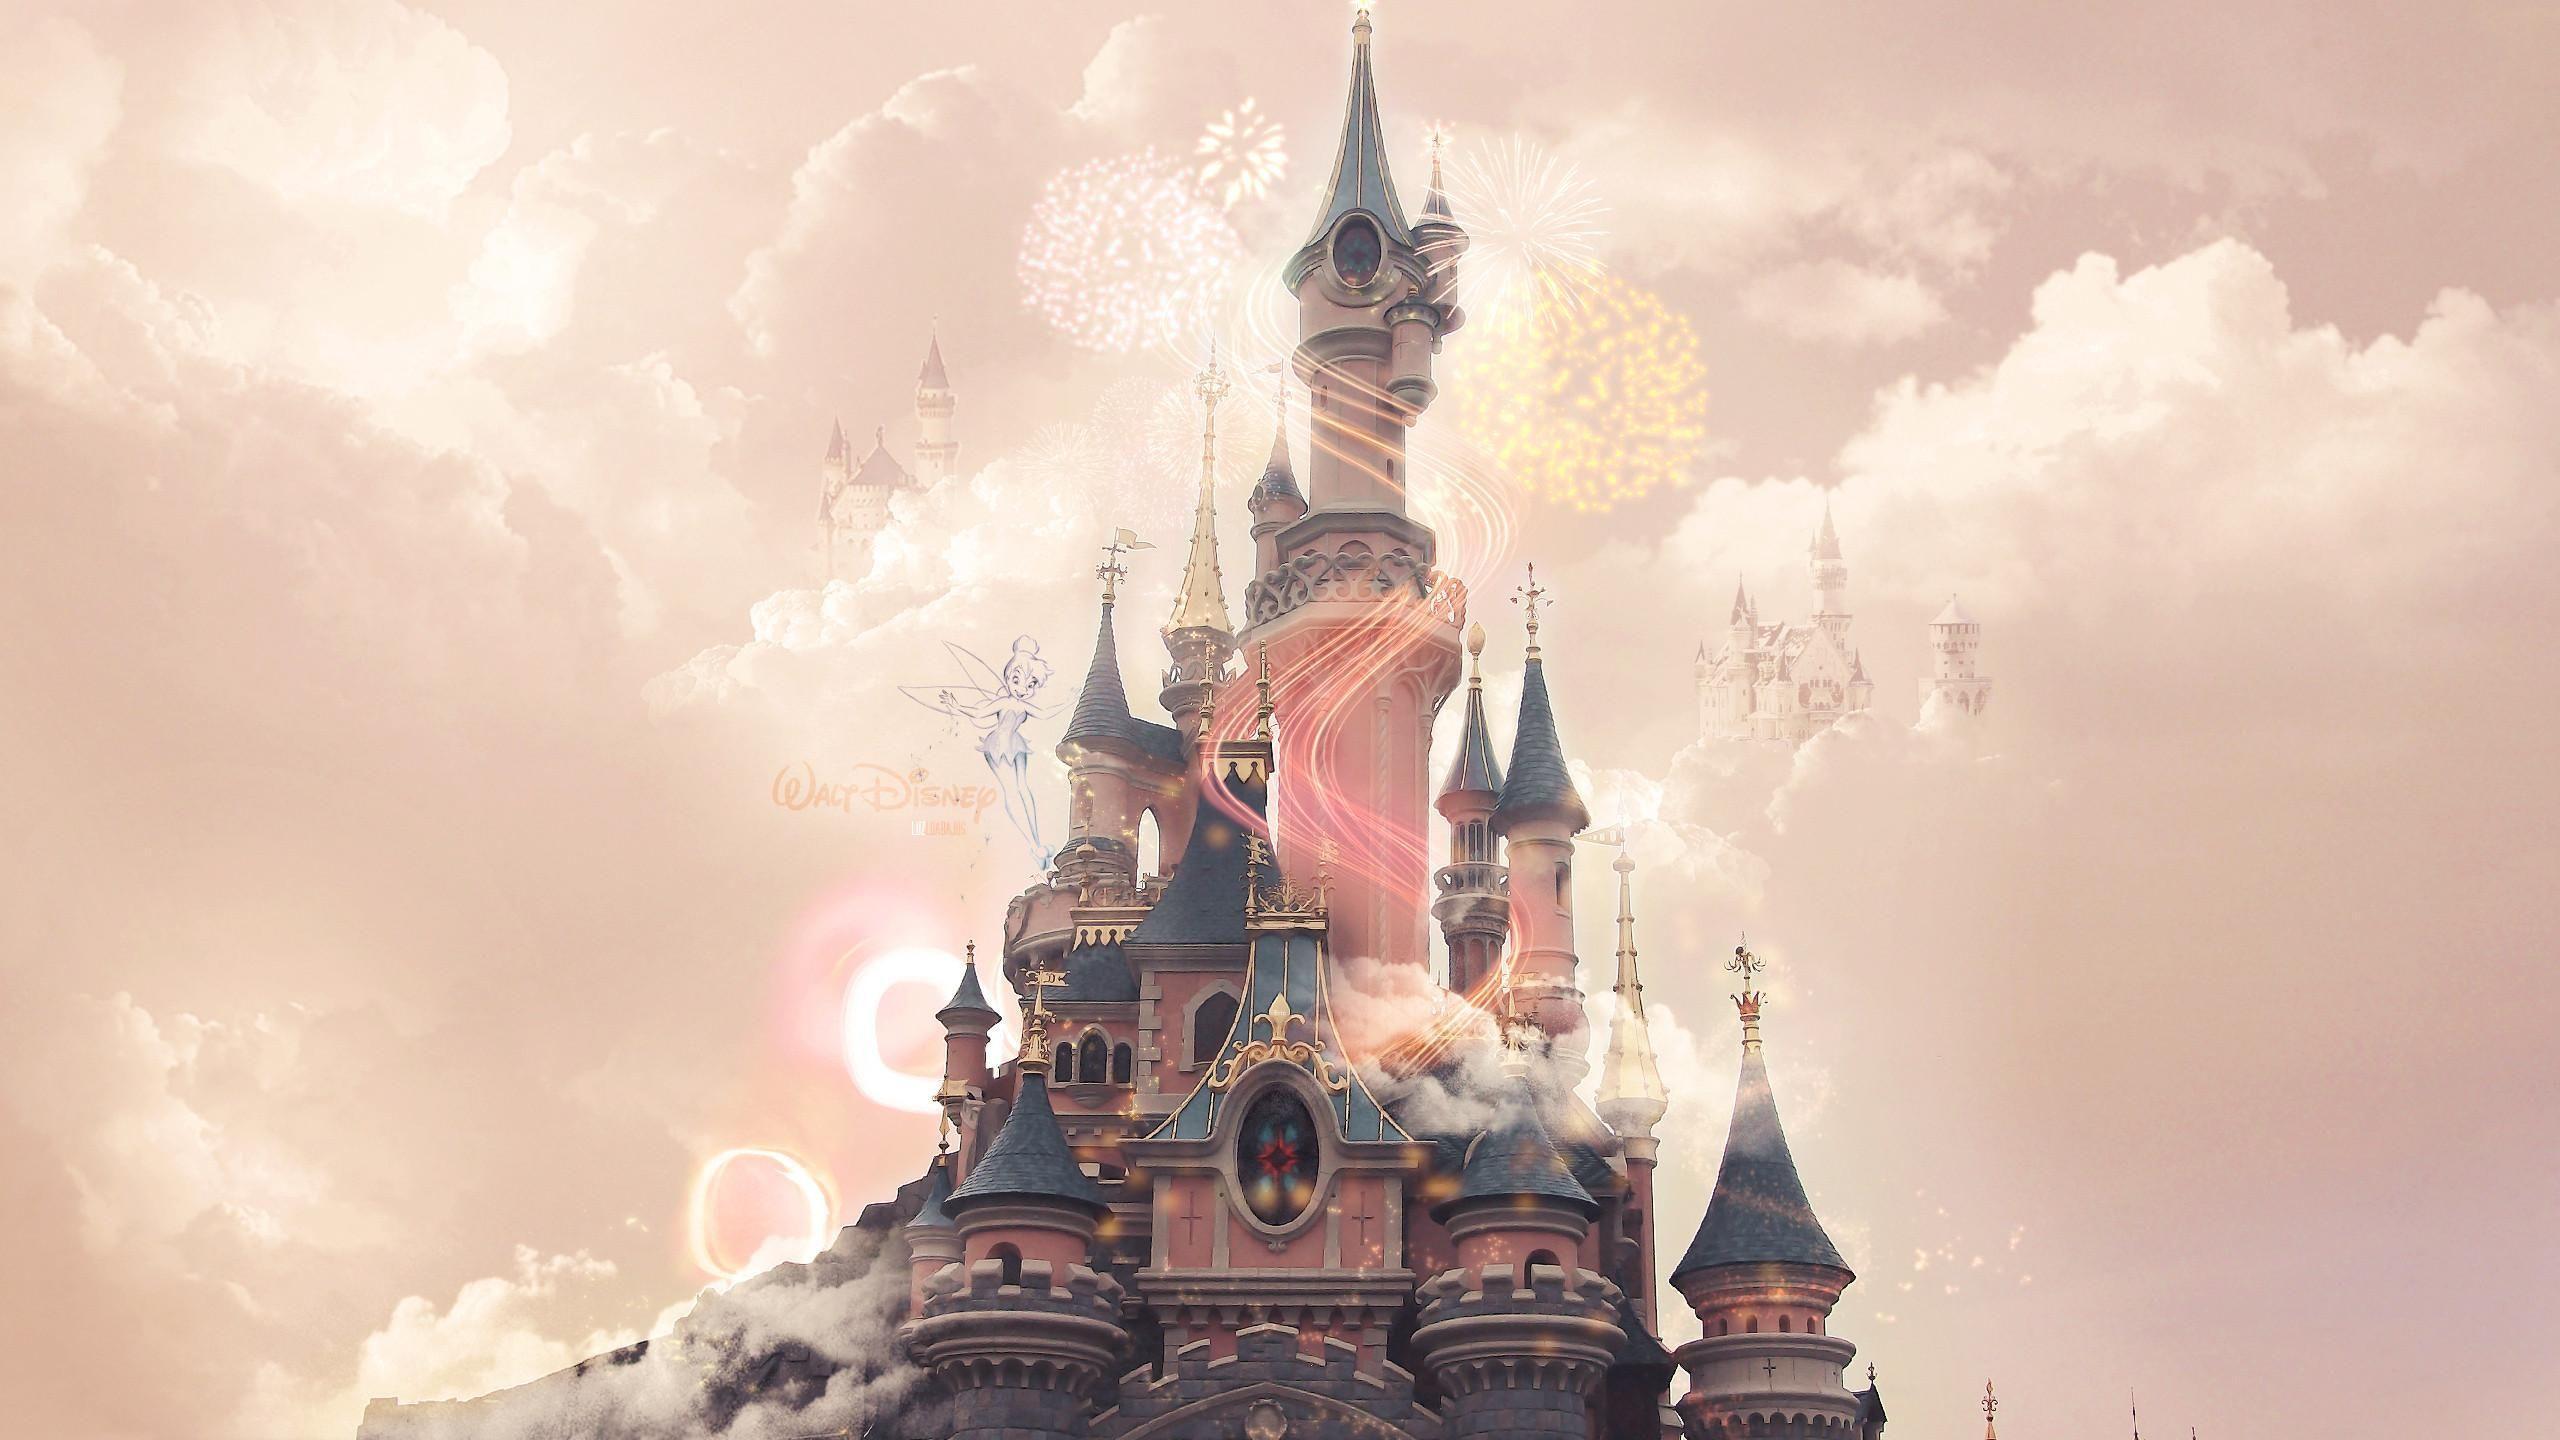 Cute Disney Computer Wallpapers Top Free Cute Disney Computer Backgrounds Wallpaperaccess